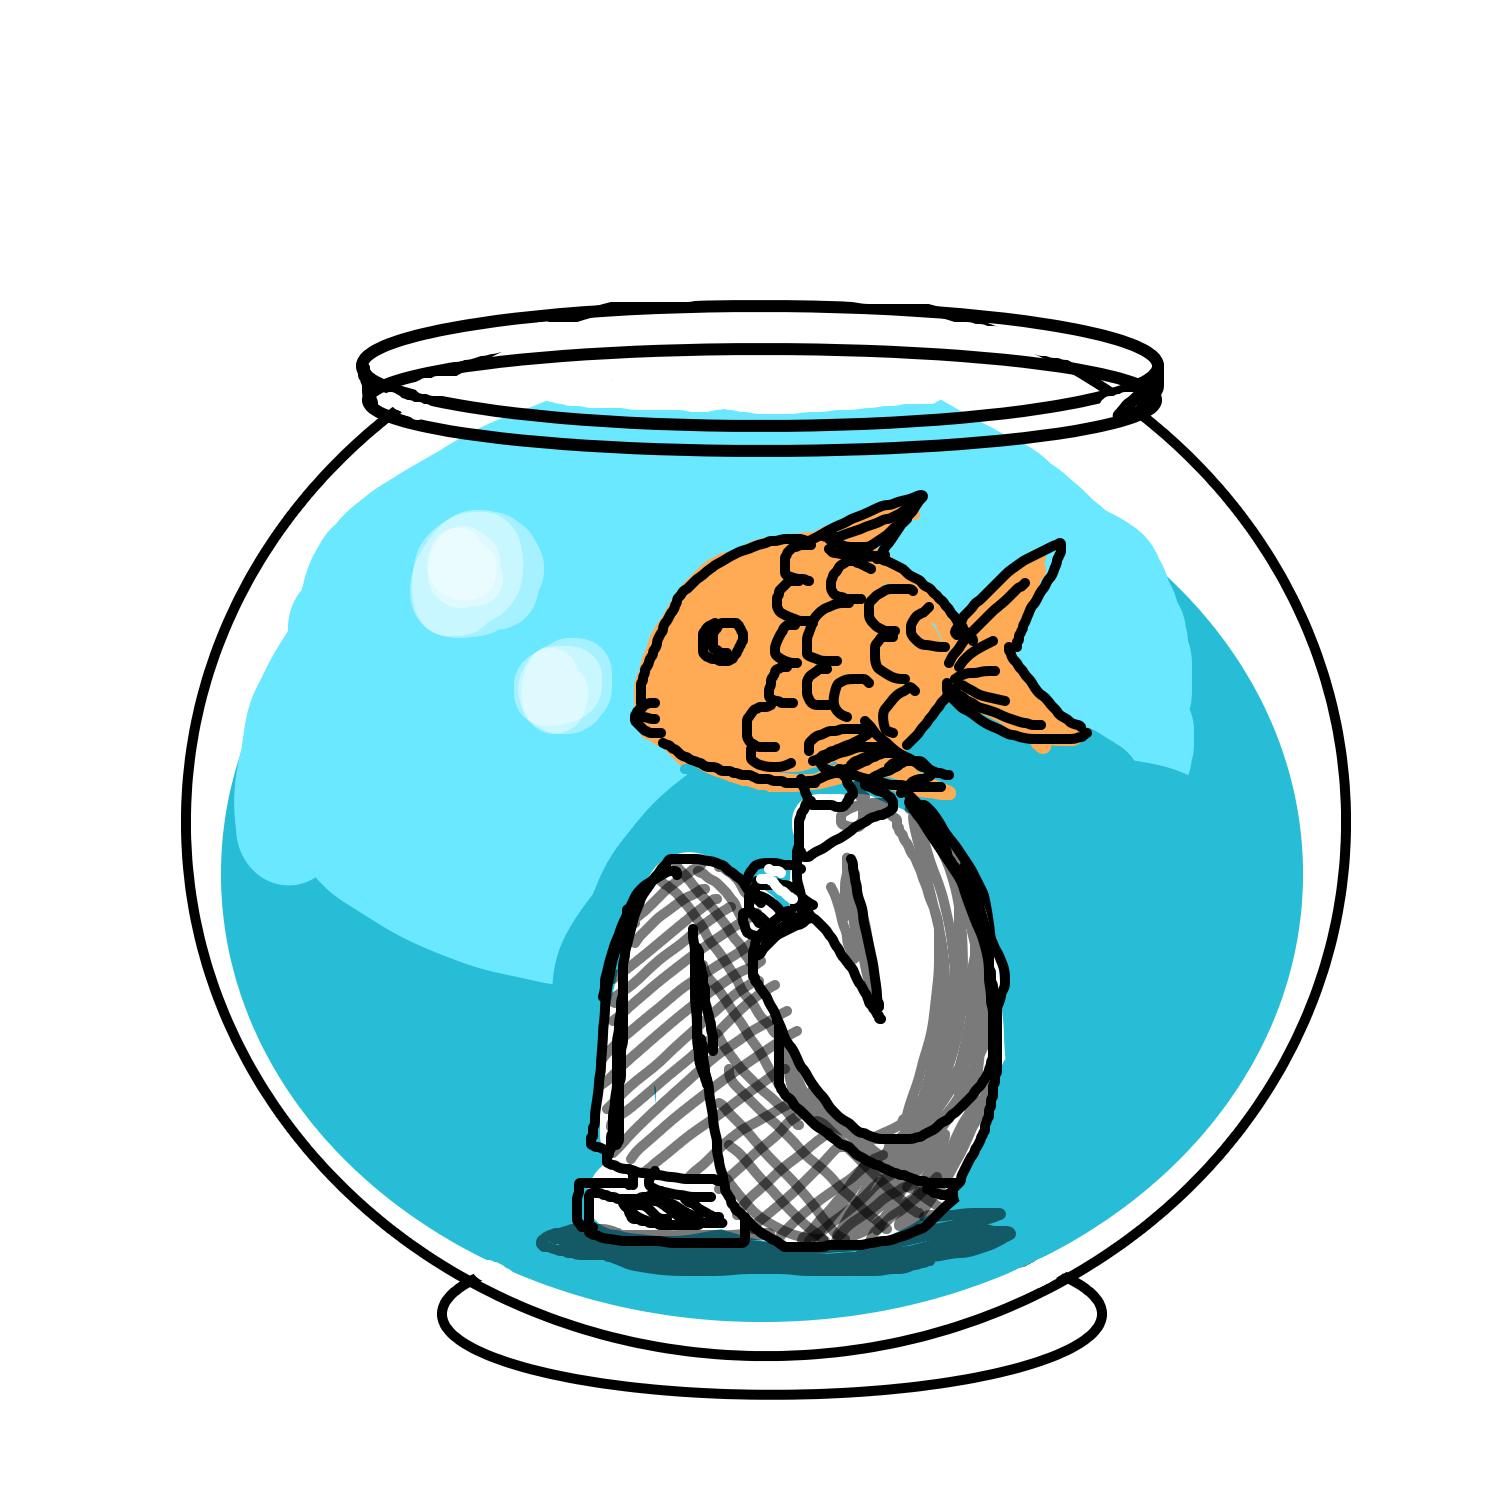 Drawing in Fish bowl  by Juleefish